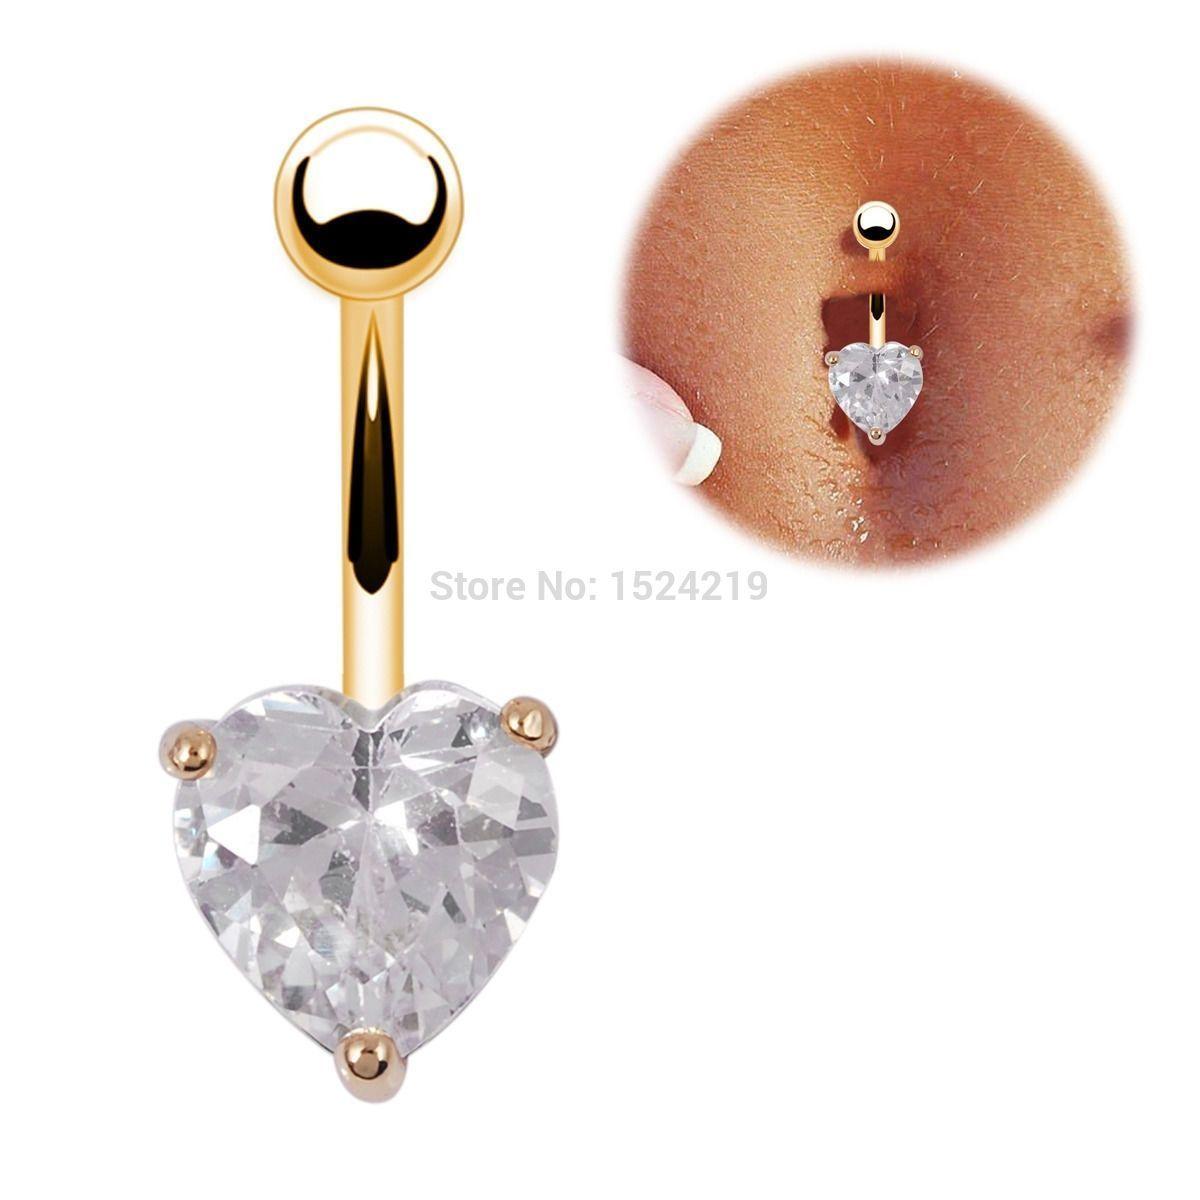 Золотой пирсинг в пупок сердечко фото 2